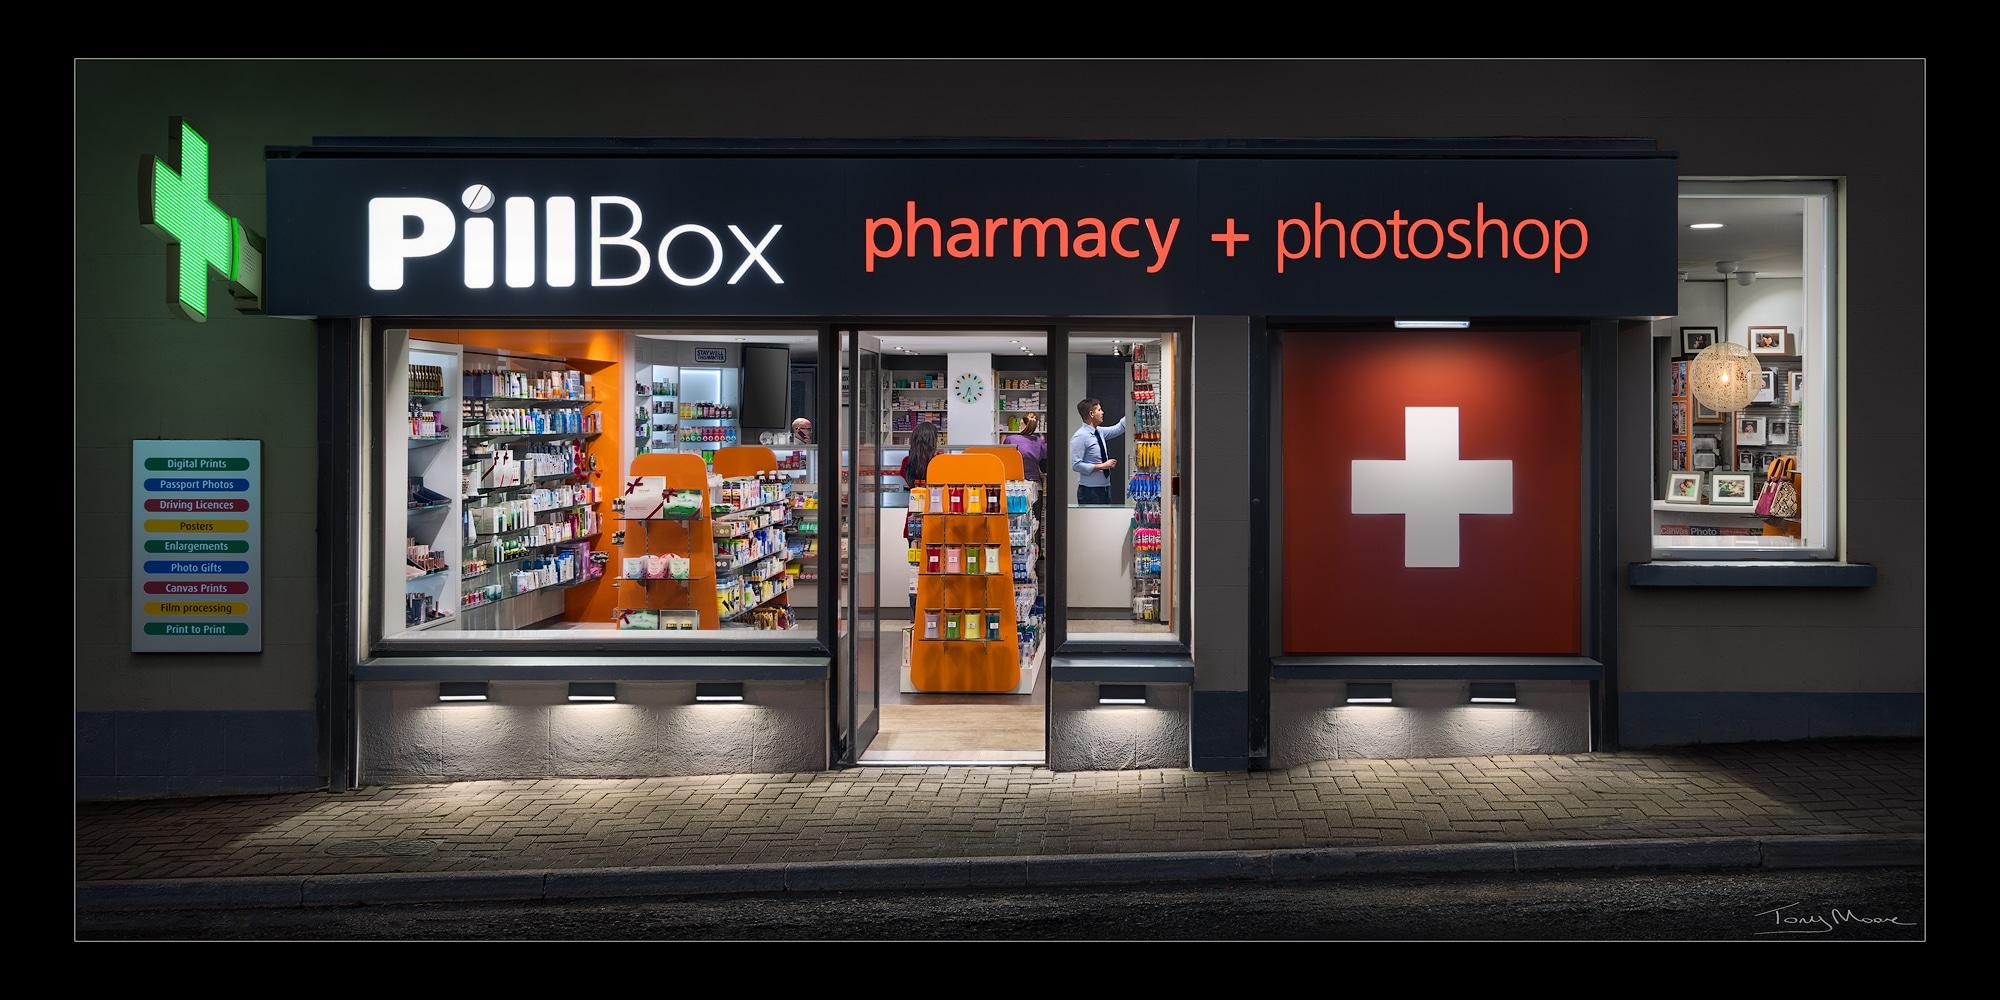 Pillbox Pharmacy